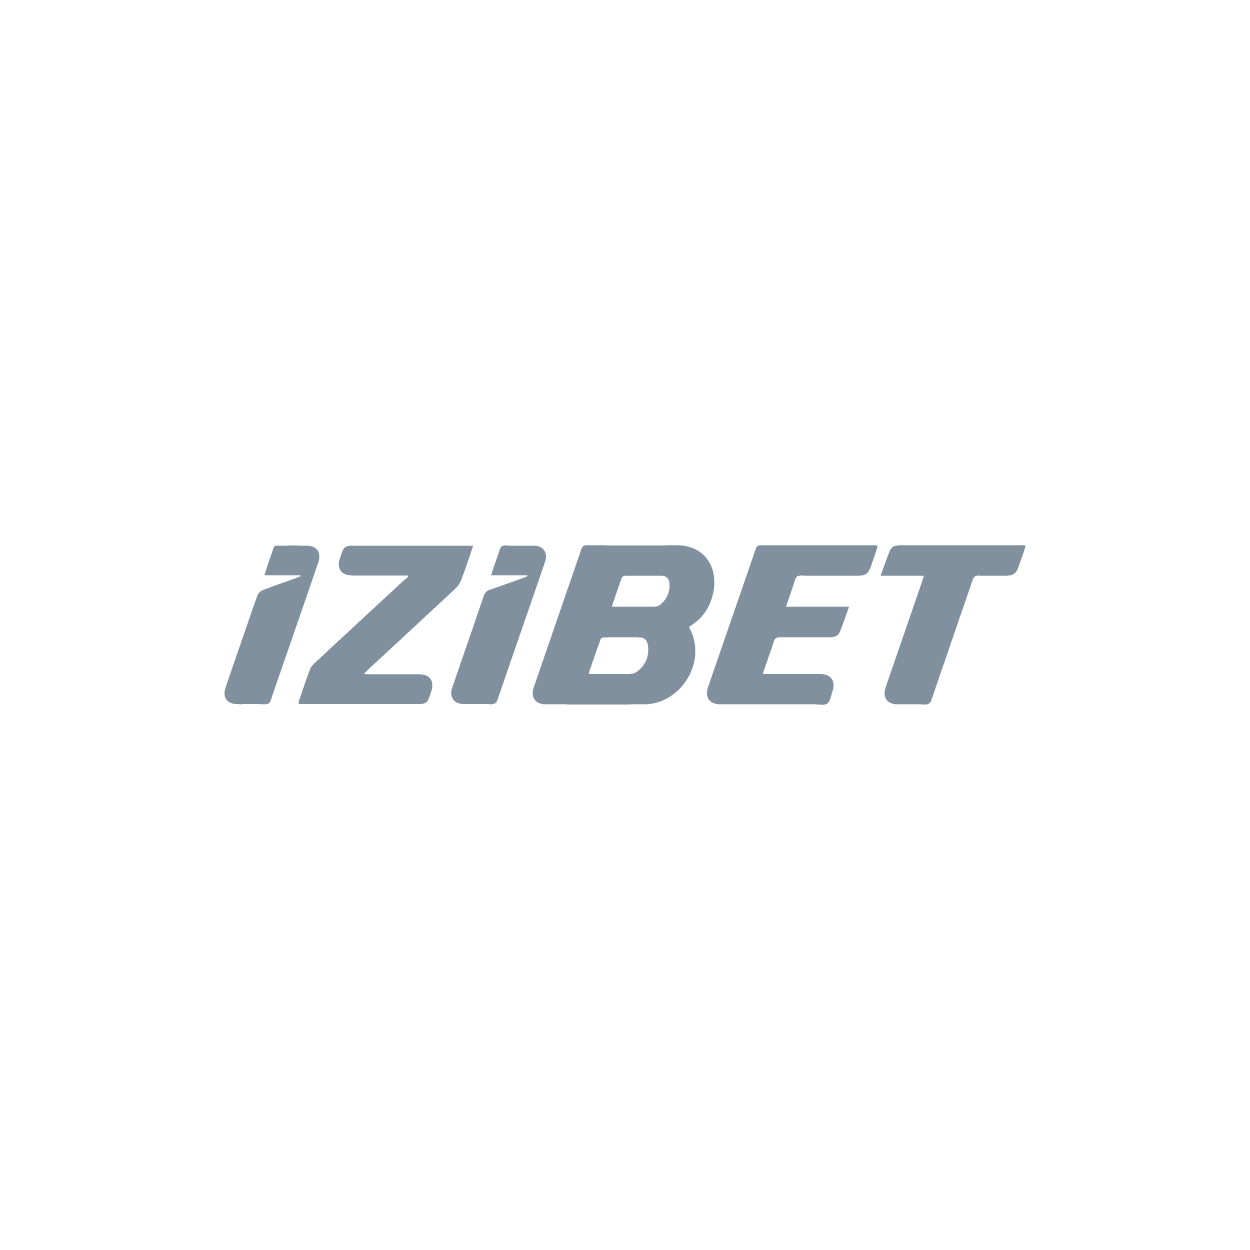 Izibet logo